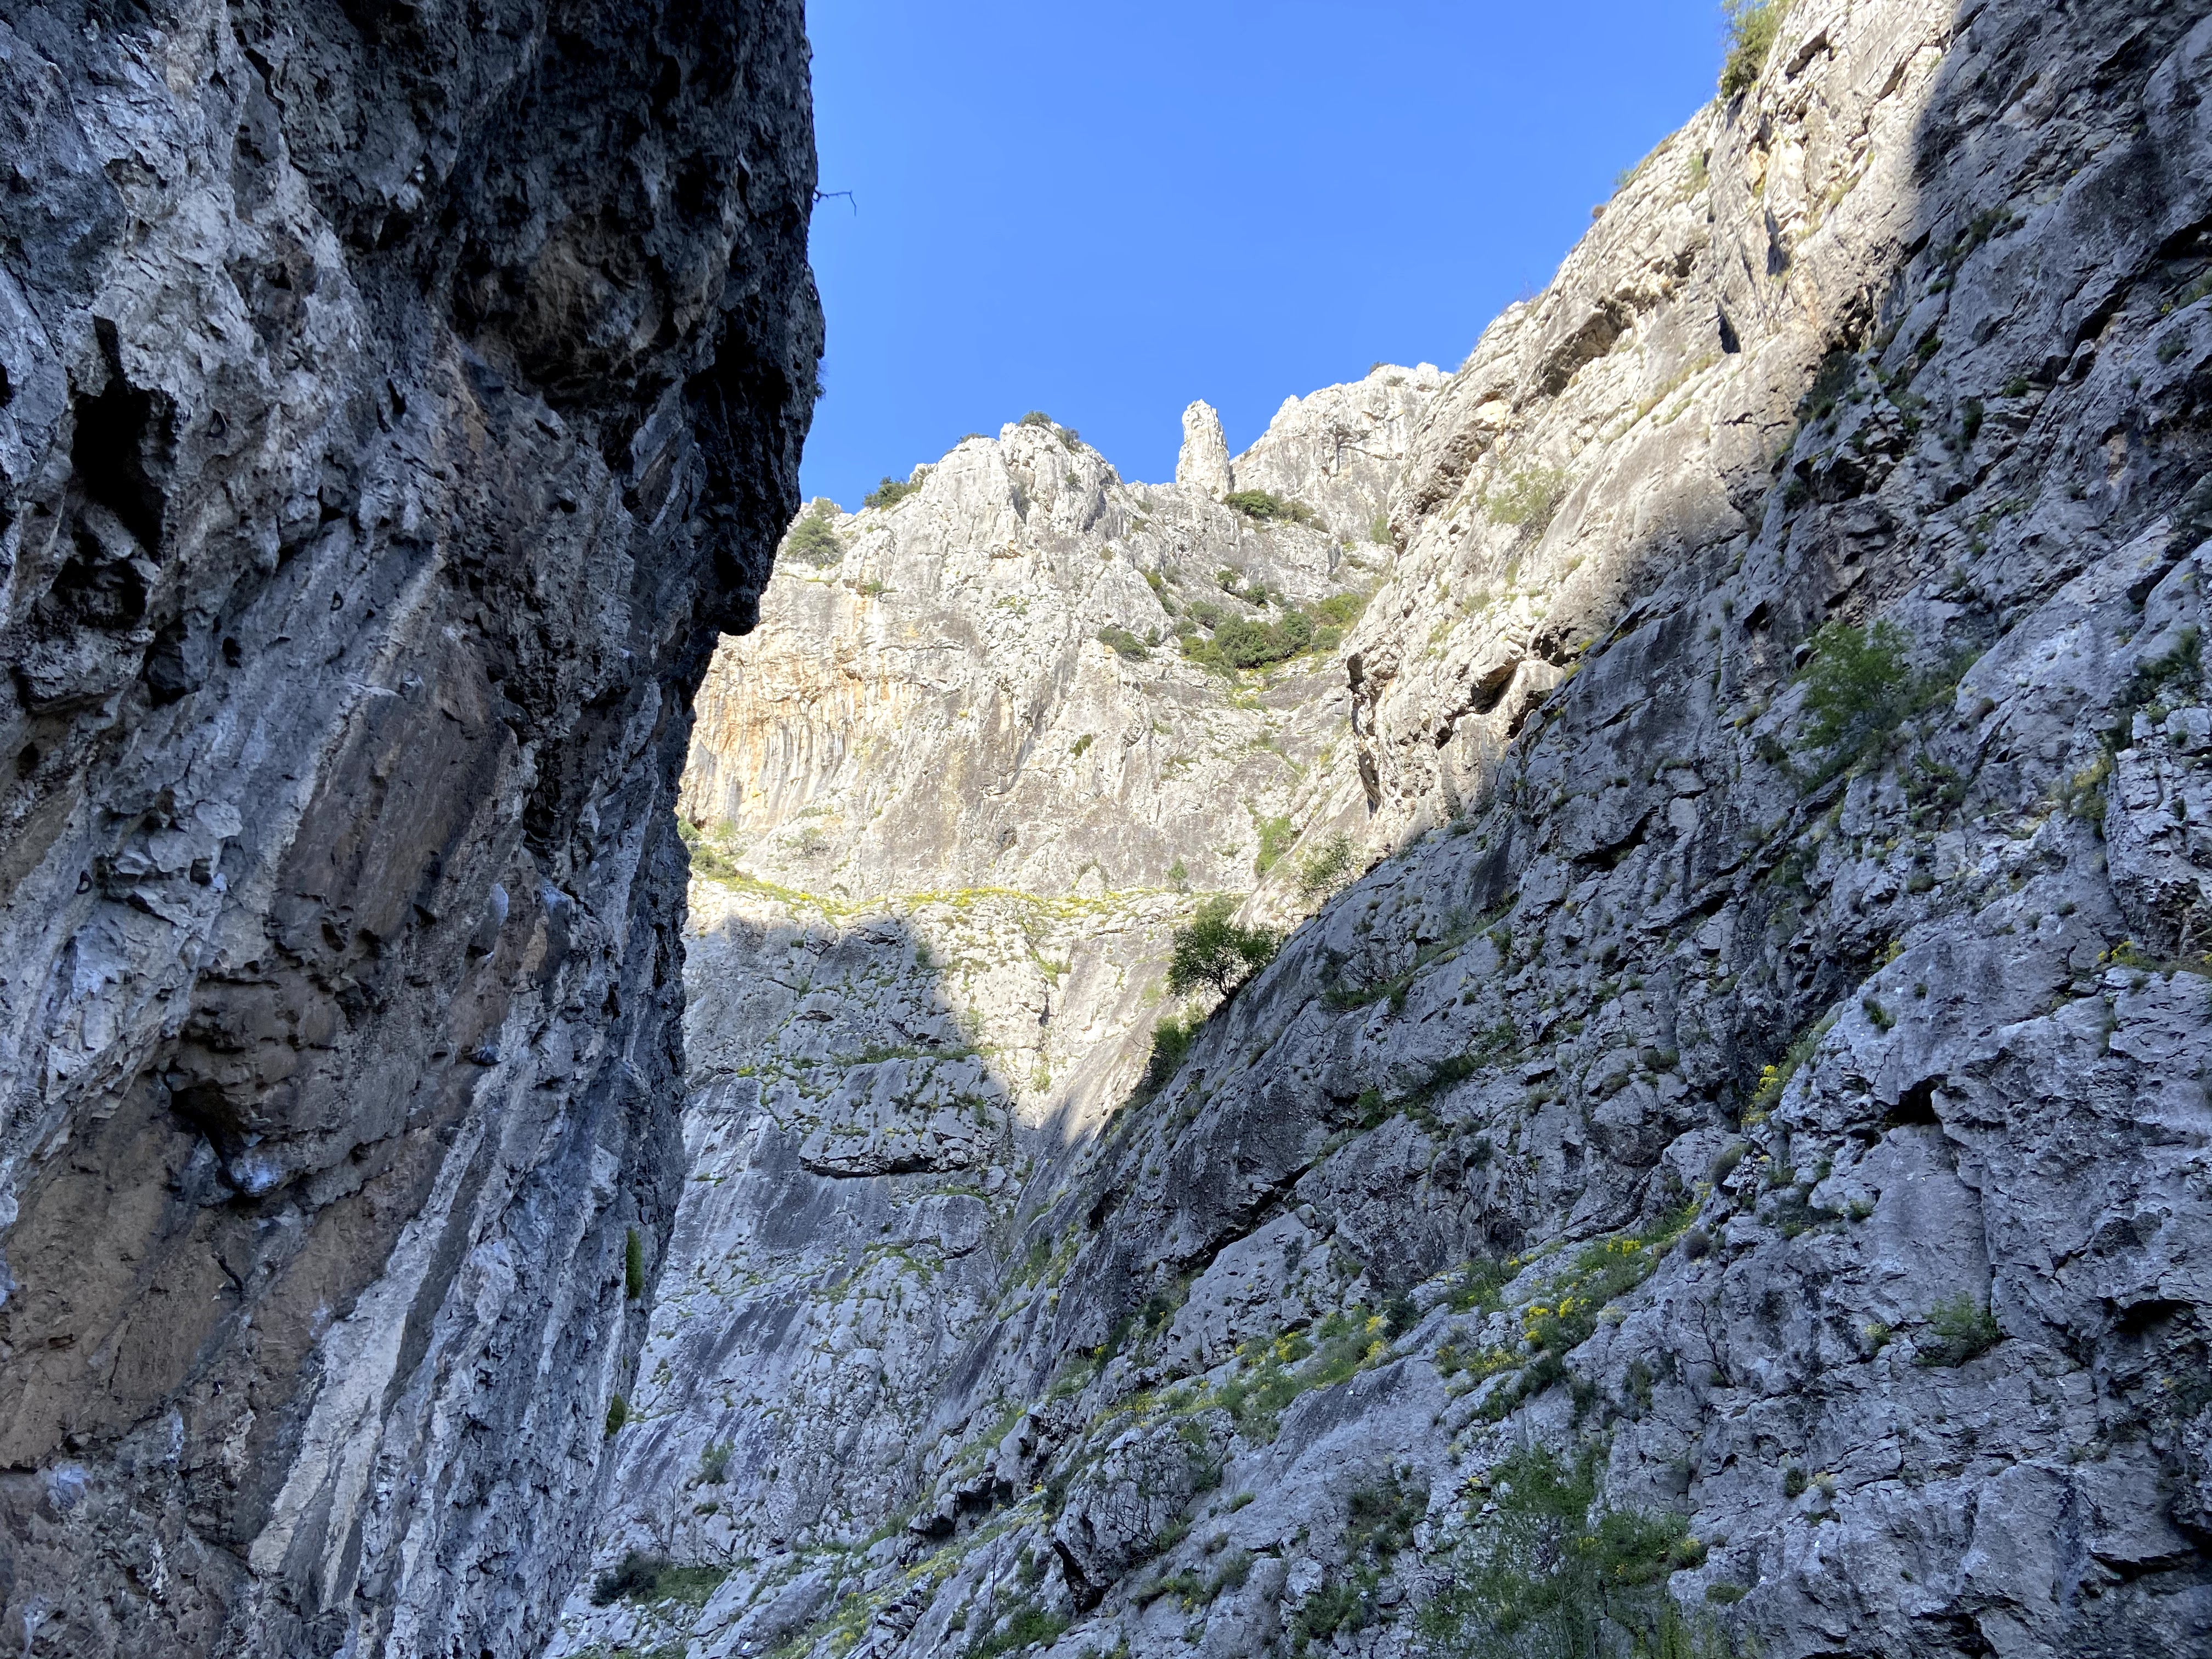 The rocky steep gorge of Demir Kapja. Rock everywhere